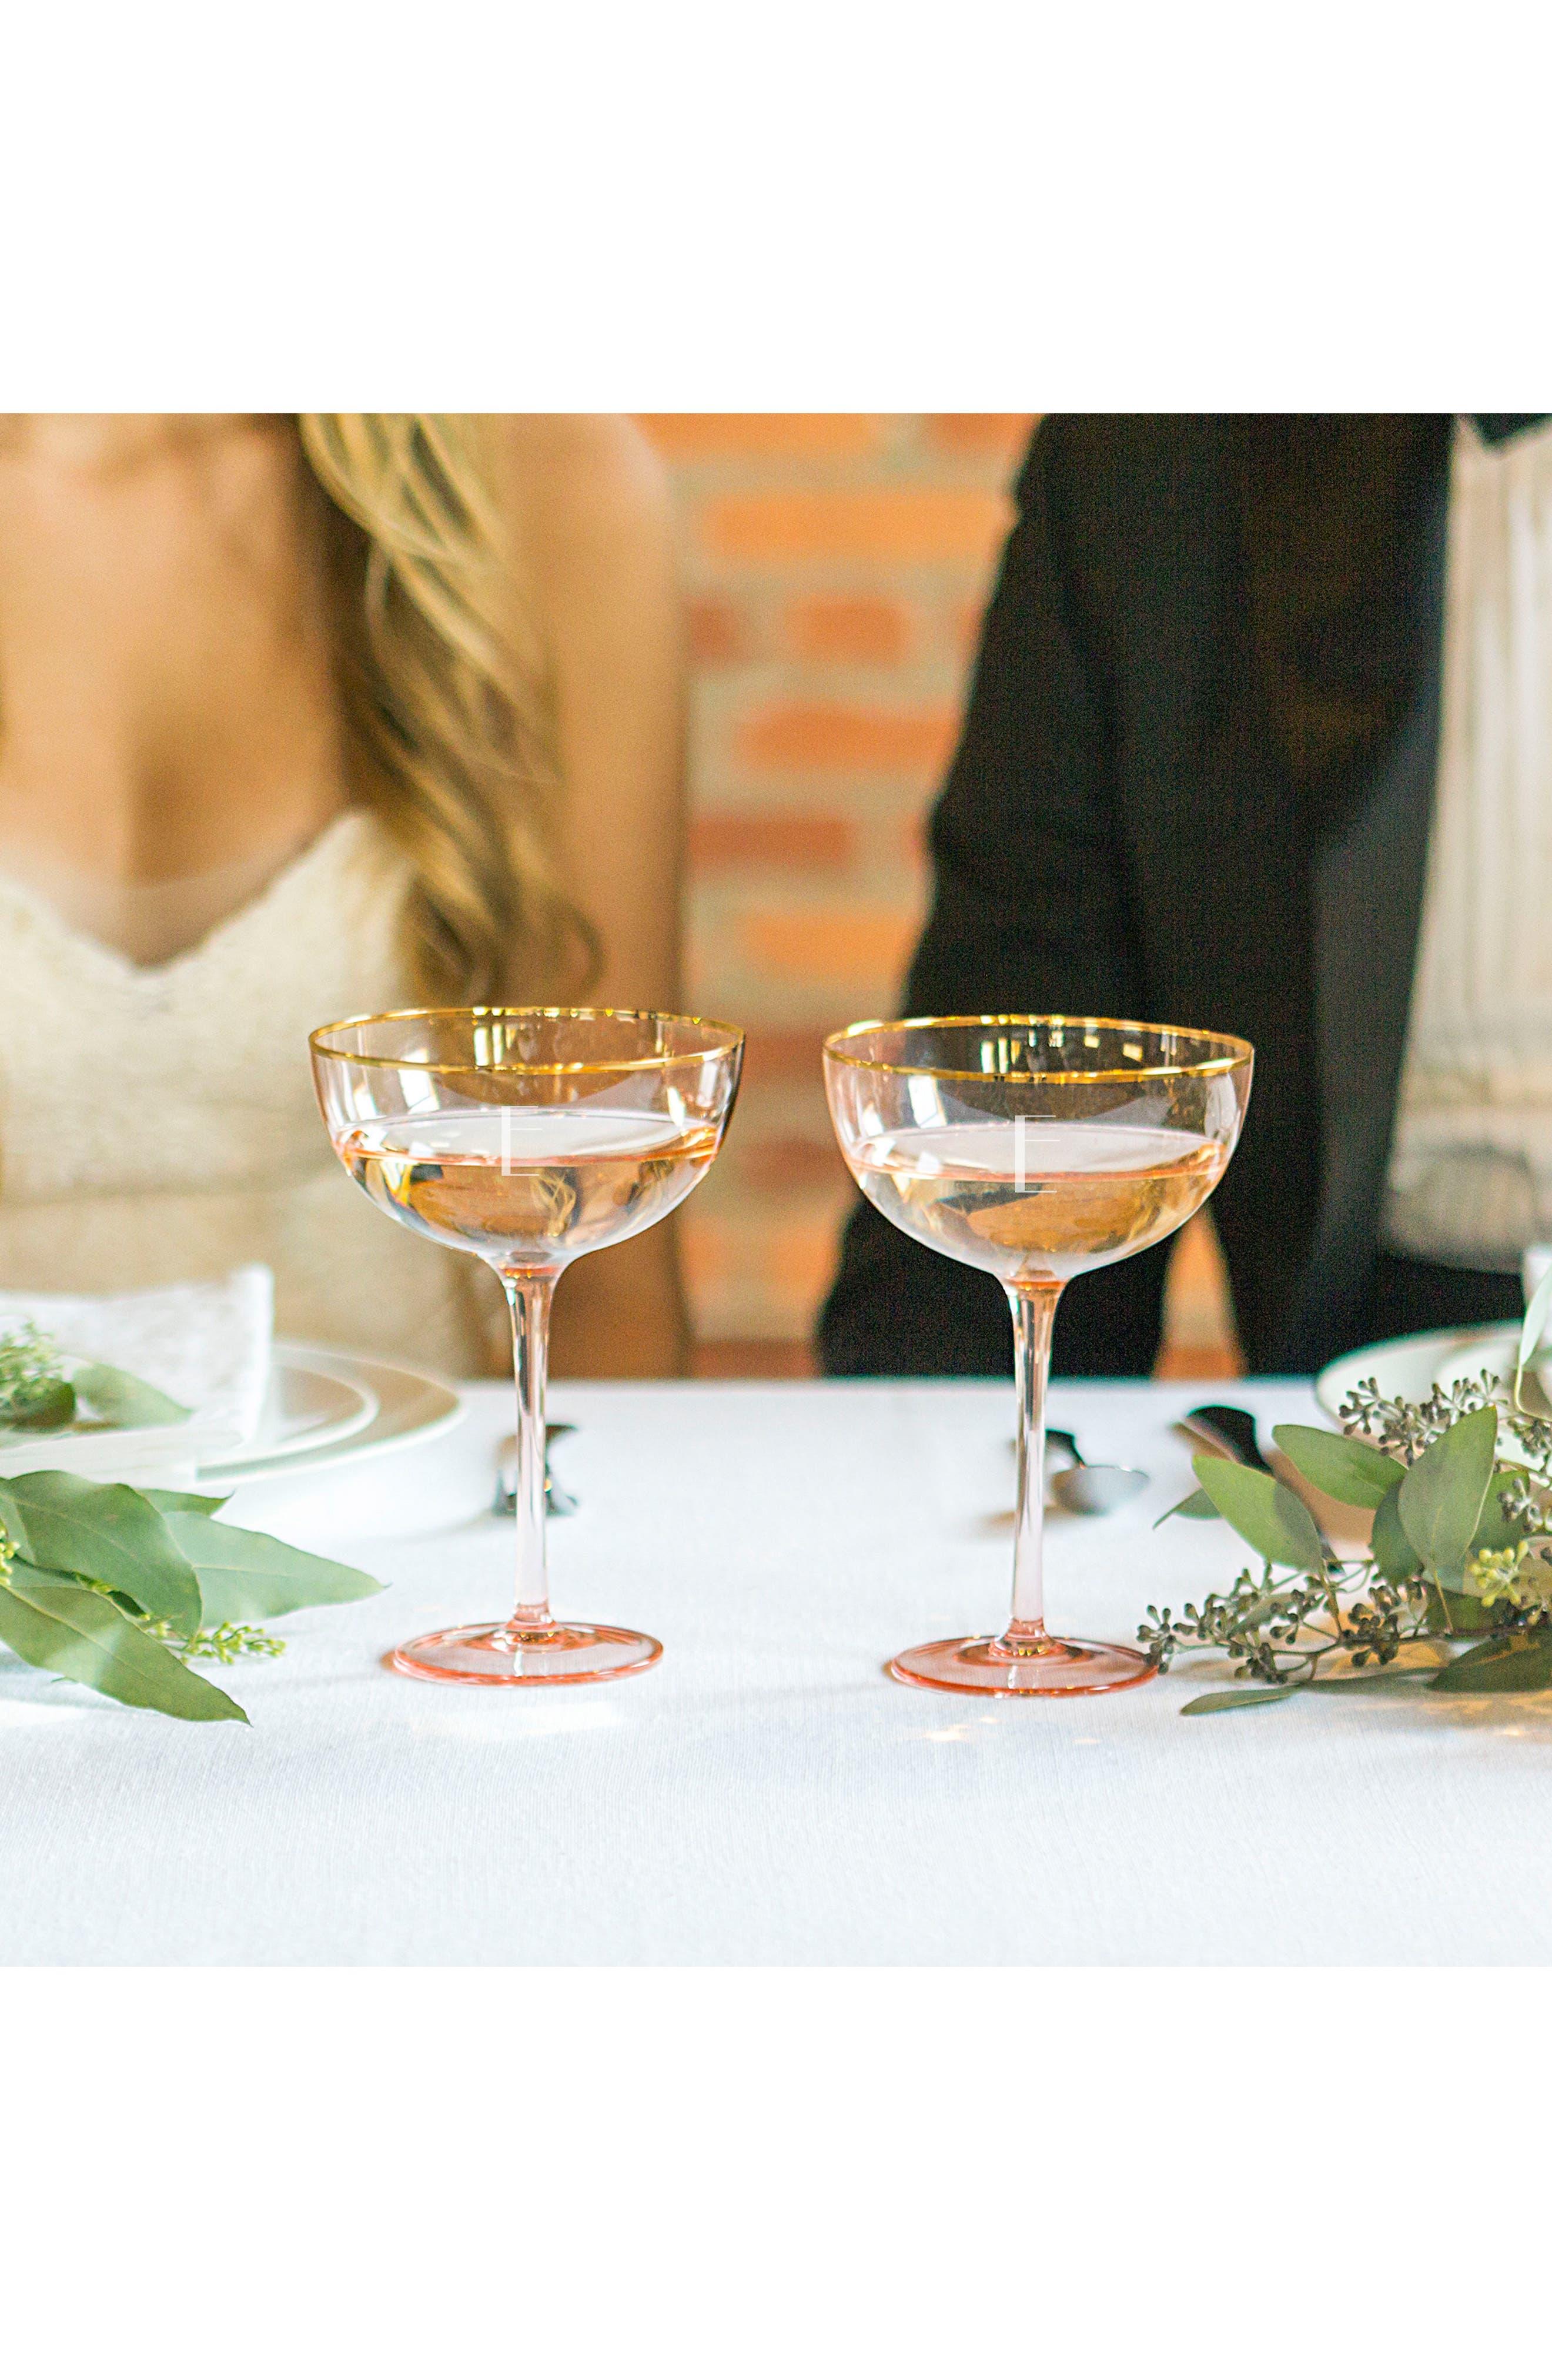 Monogram Set of 2 Champagne Coupes,                             Alternate thumbnail 5, color,                             220